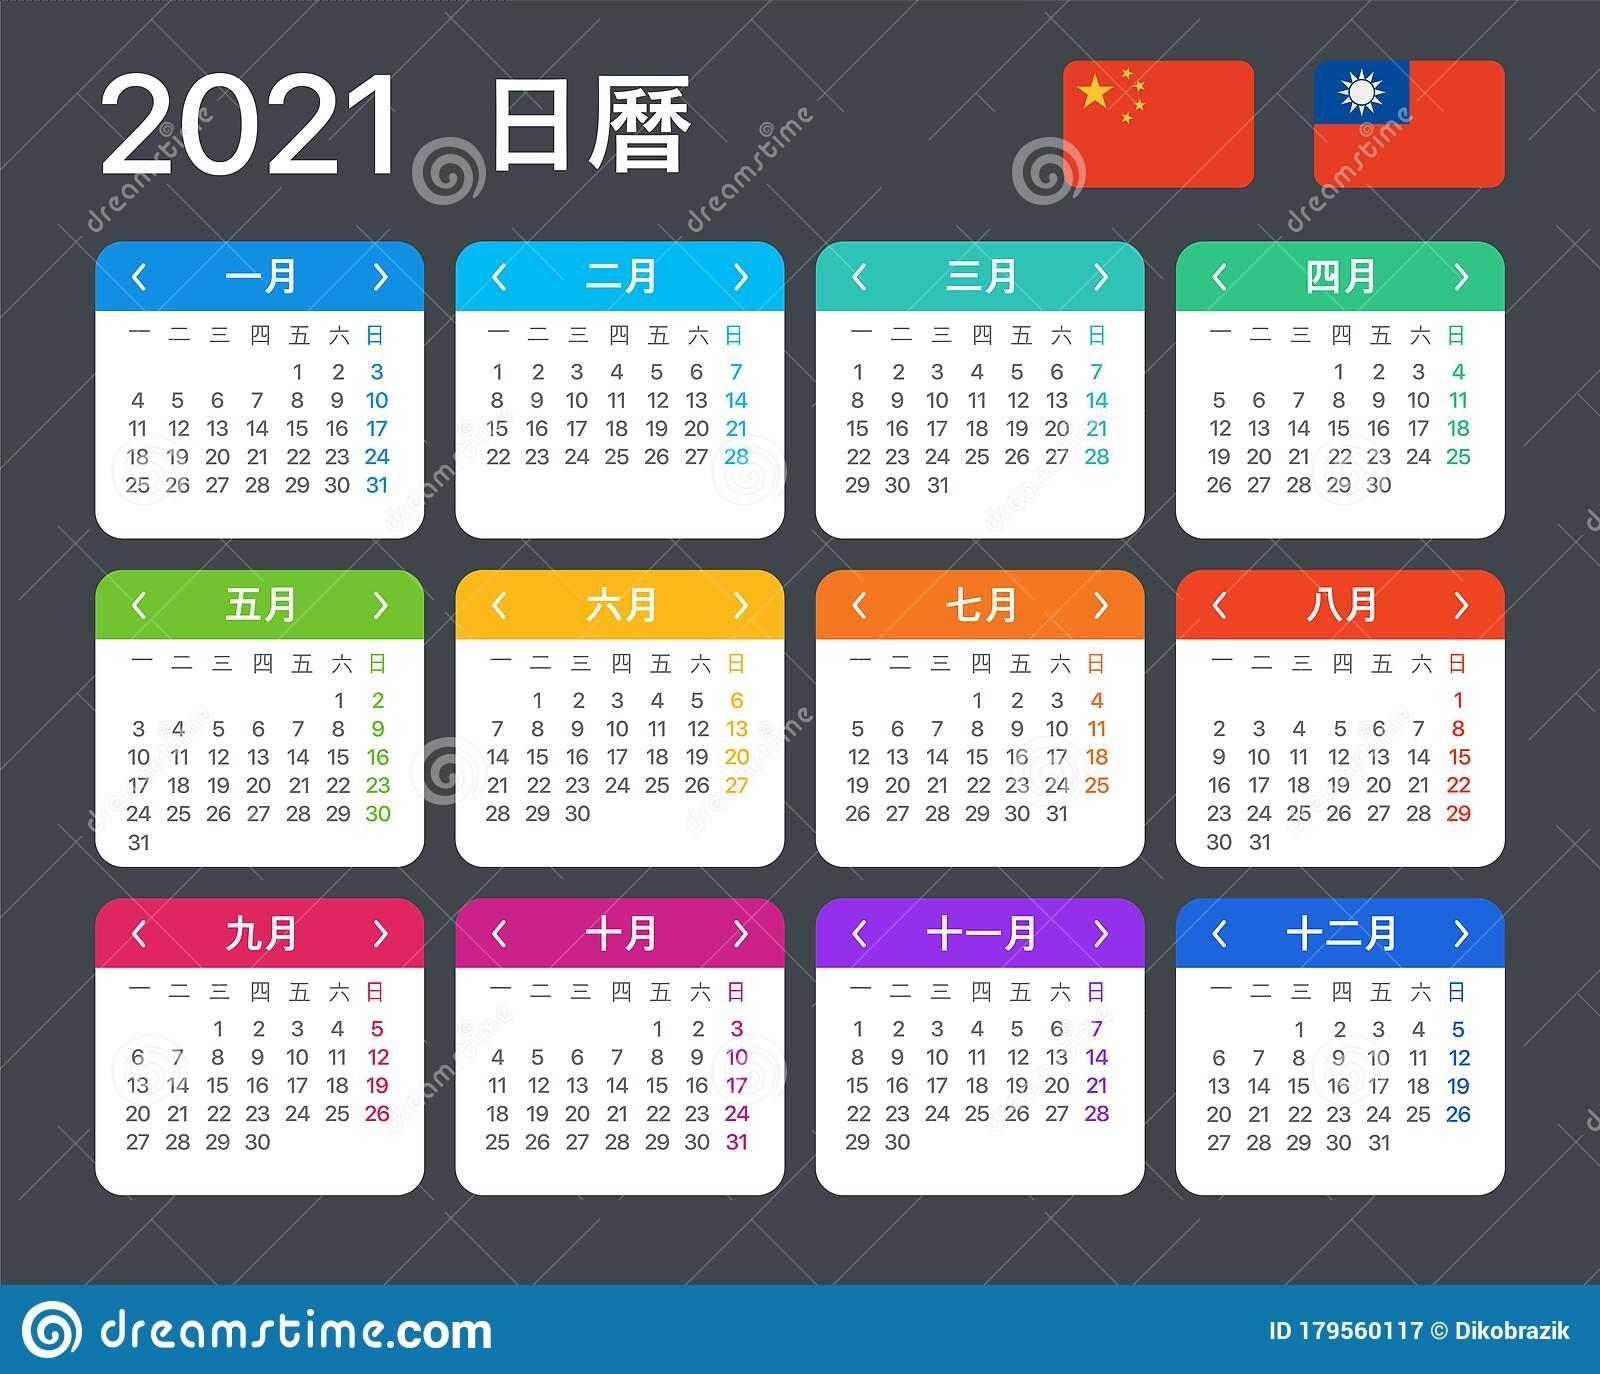 Get China Holiday Calendar 2021